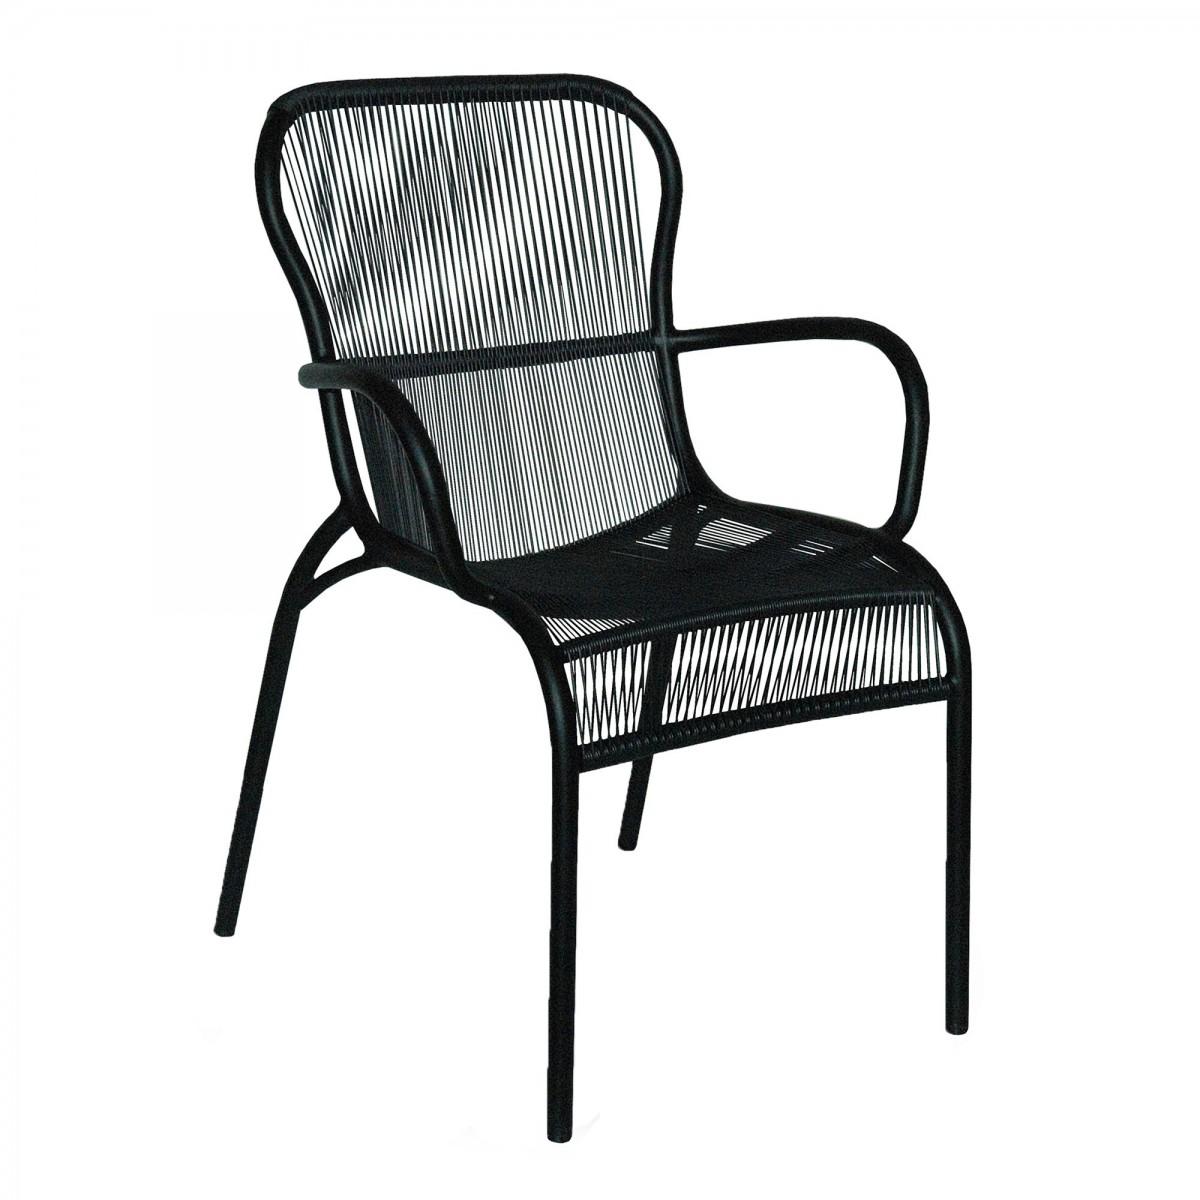 Loop Chair Black Vincent Sheppard